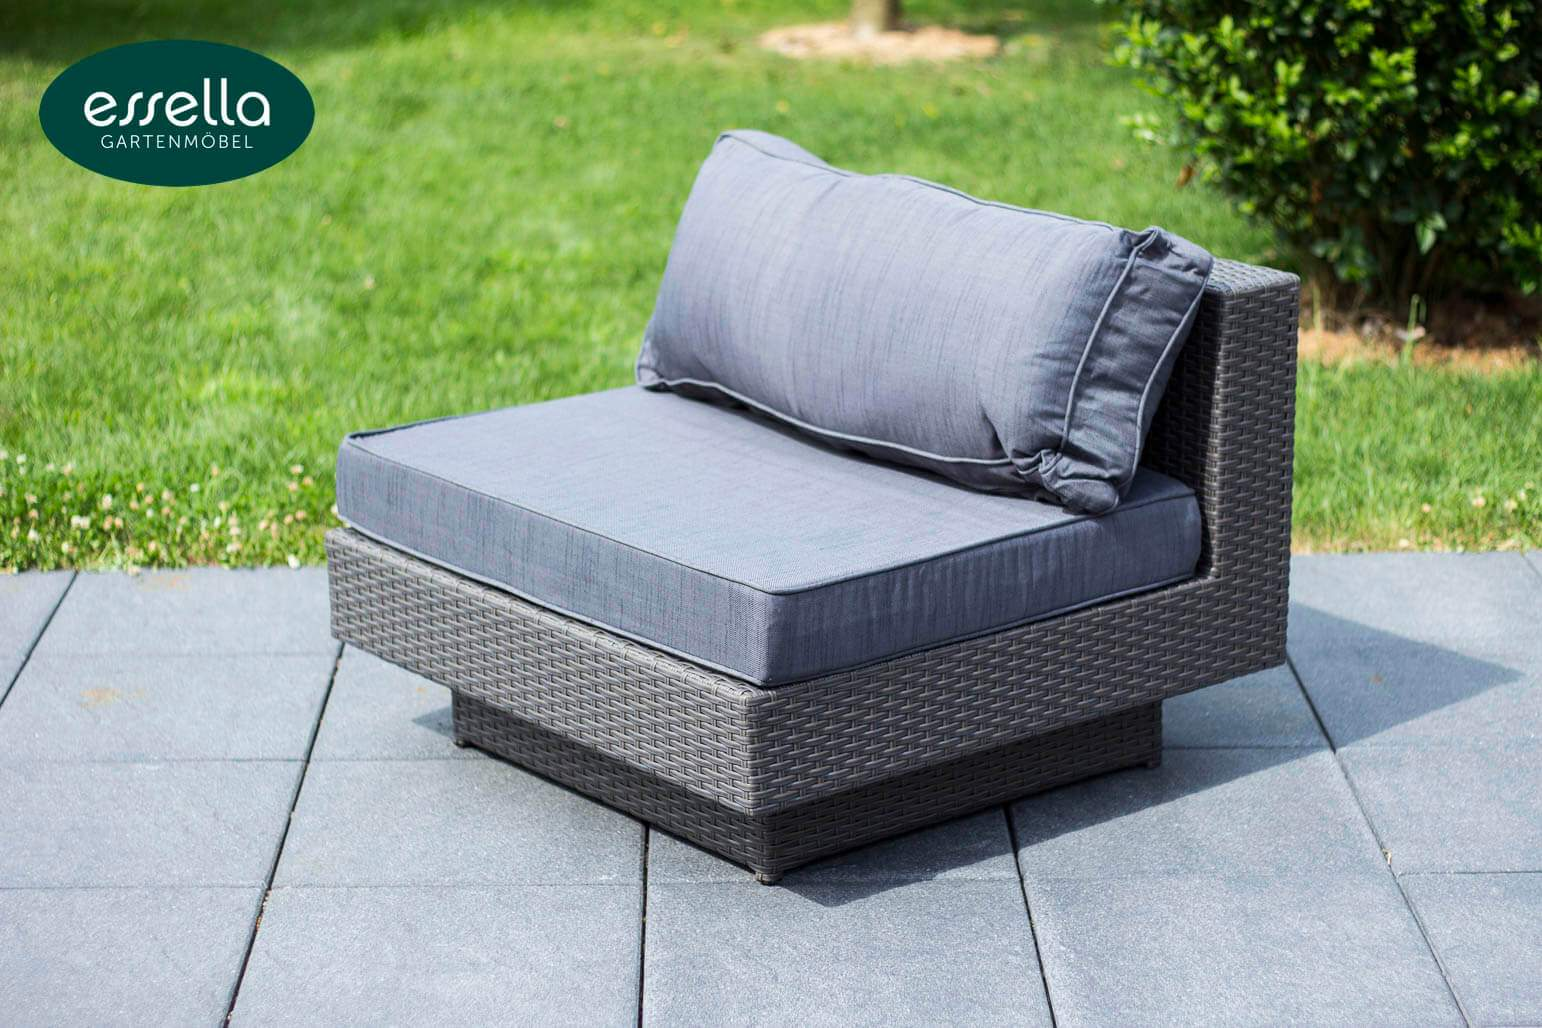 essella polyrattan loungemoebel sitzgruppe melbourne grau flachgeflecht detail 06